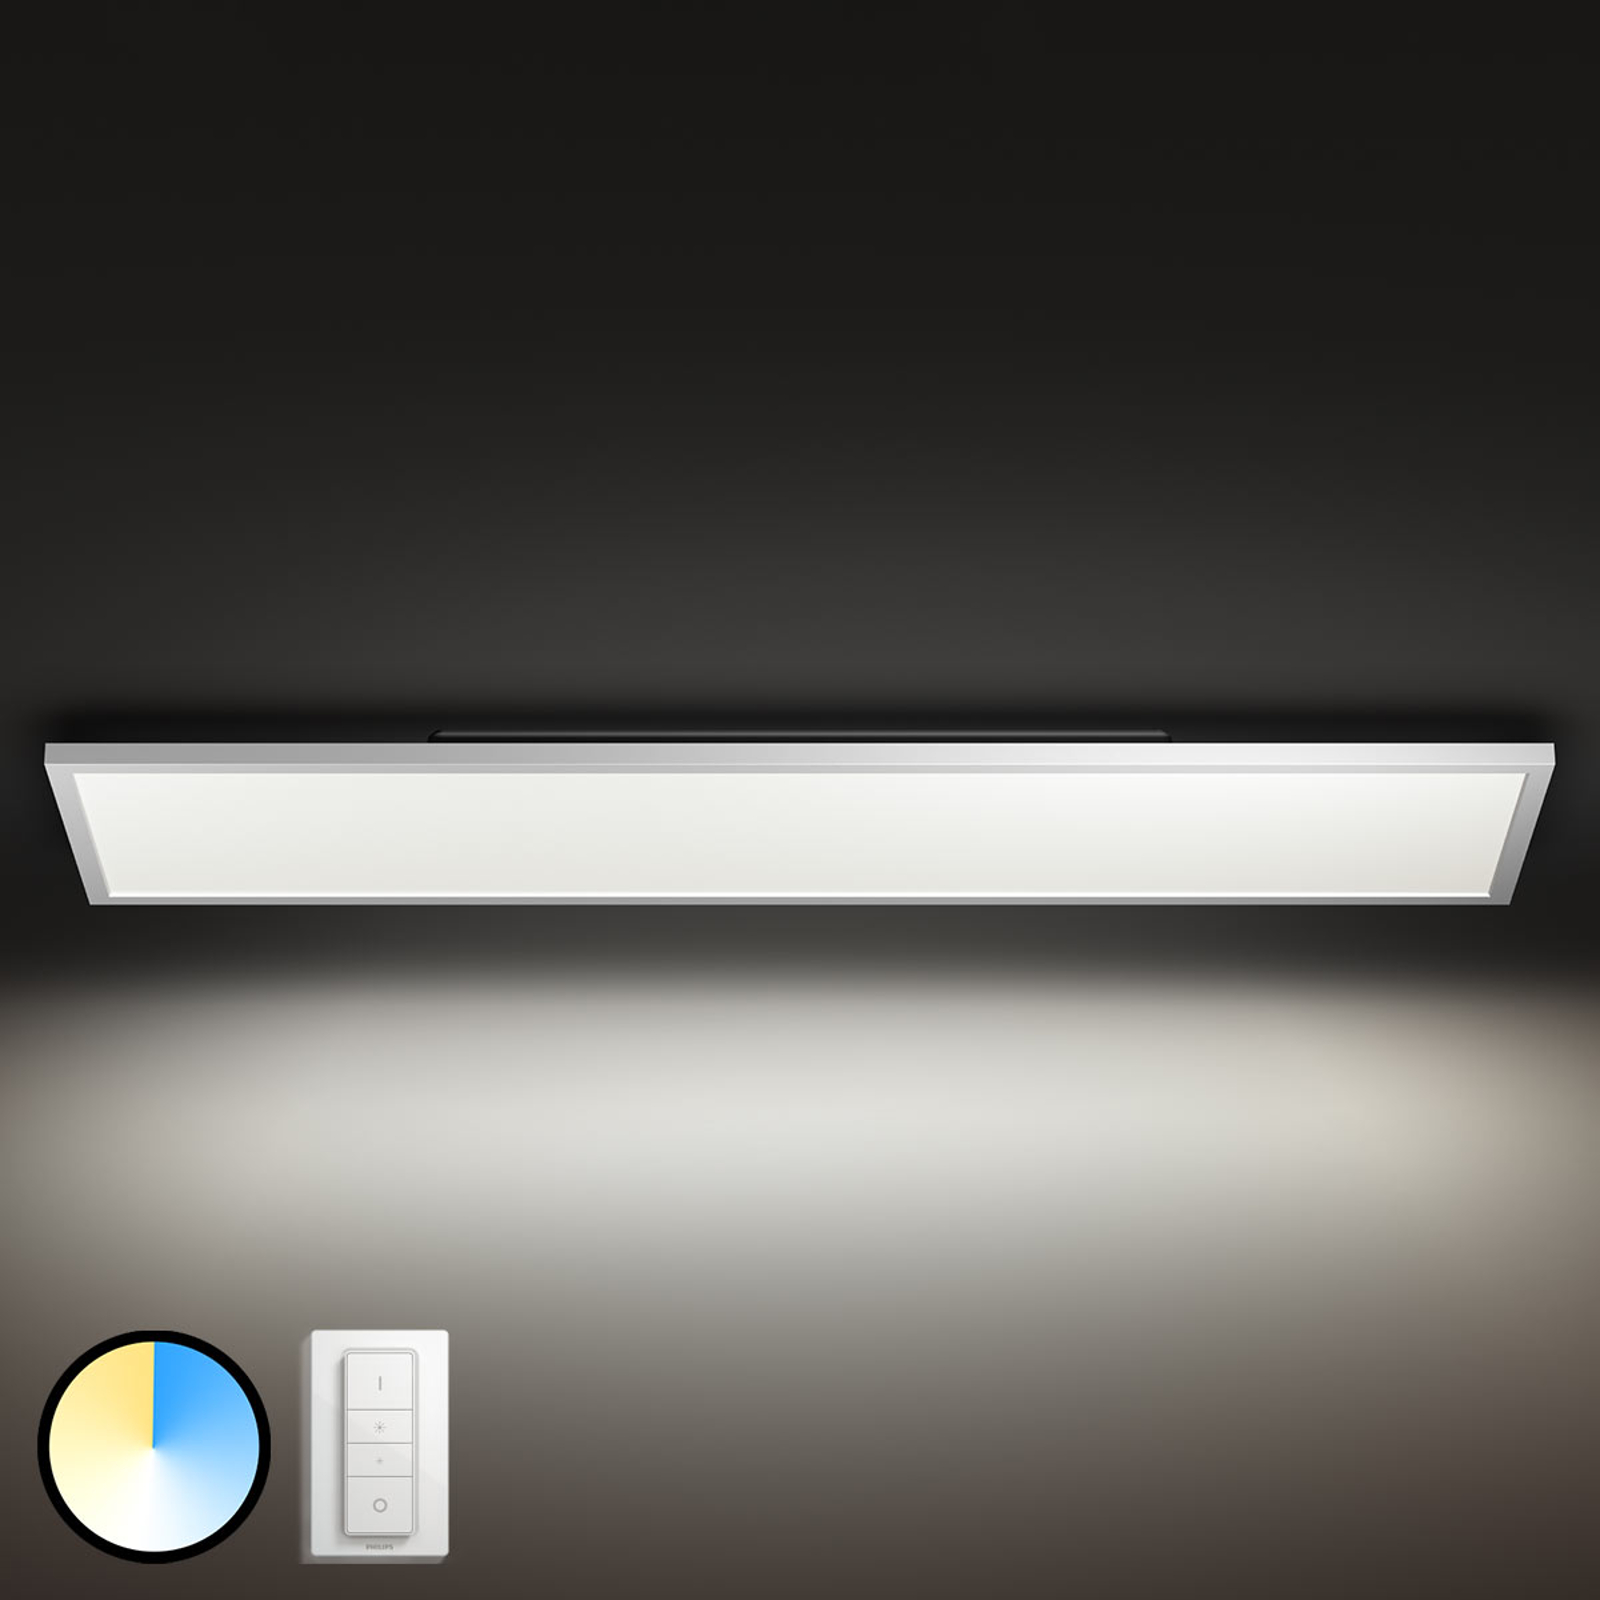 Philips Hue Aurelle panel LED angular, 120 x 30 cm